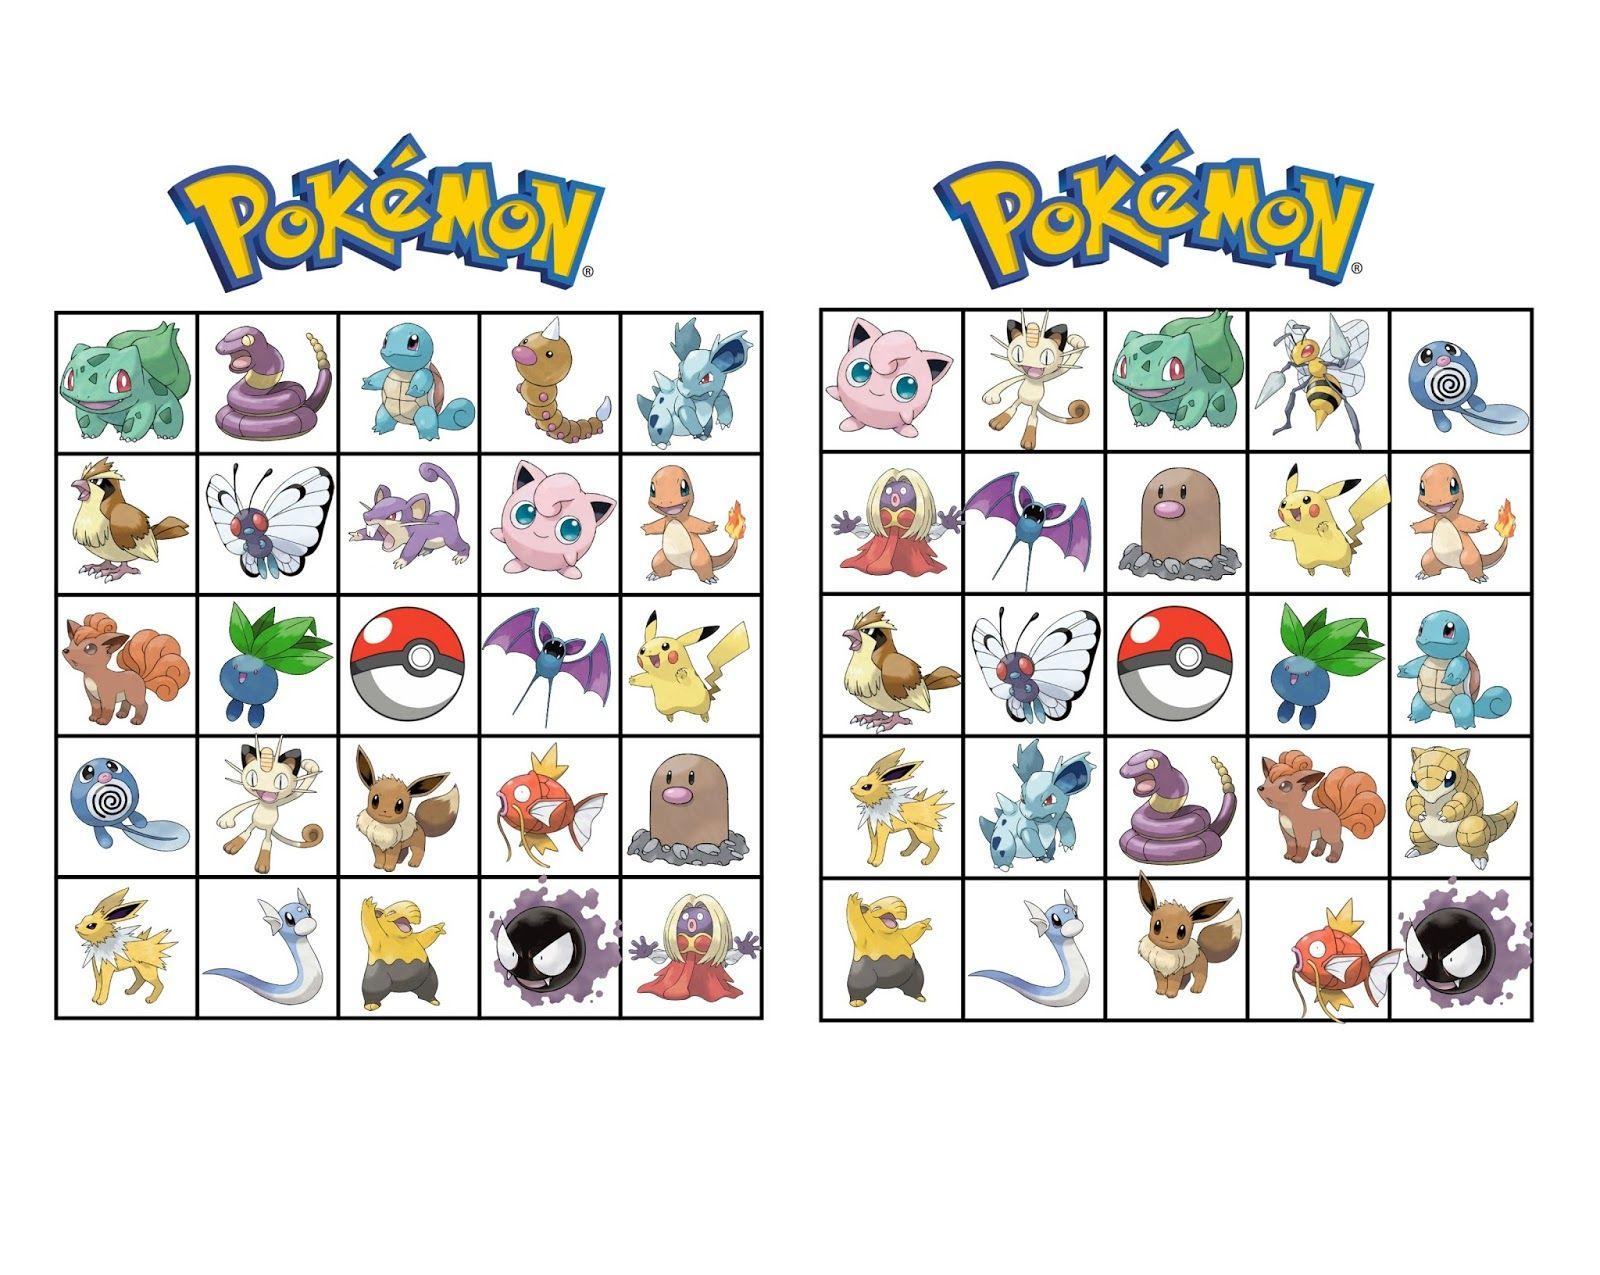 Pokemon+Bingo 1.600×1.275 Pixels | Pokemon Afbeeldingen